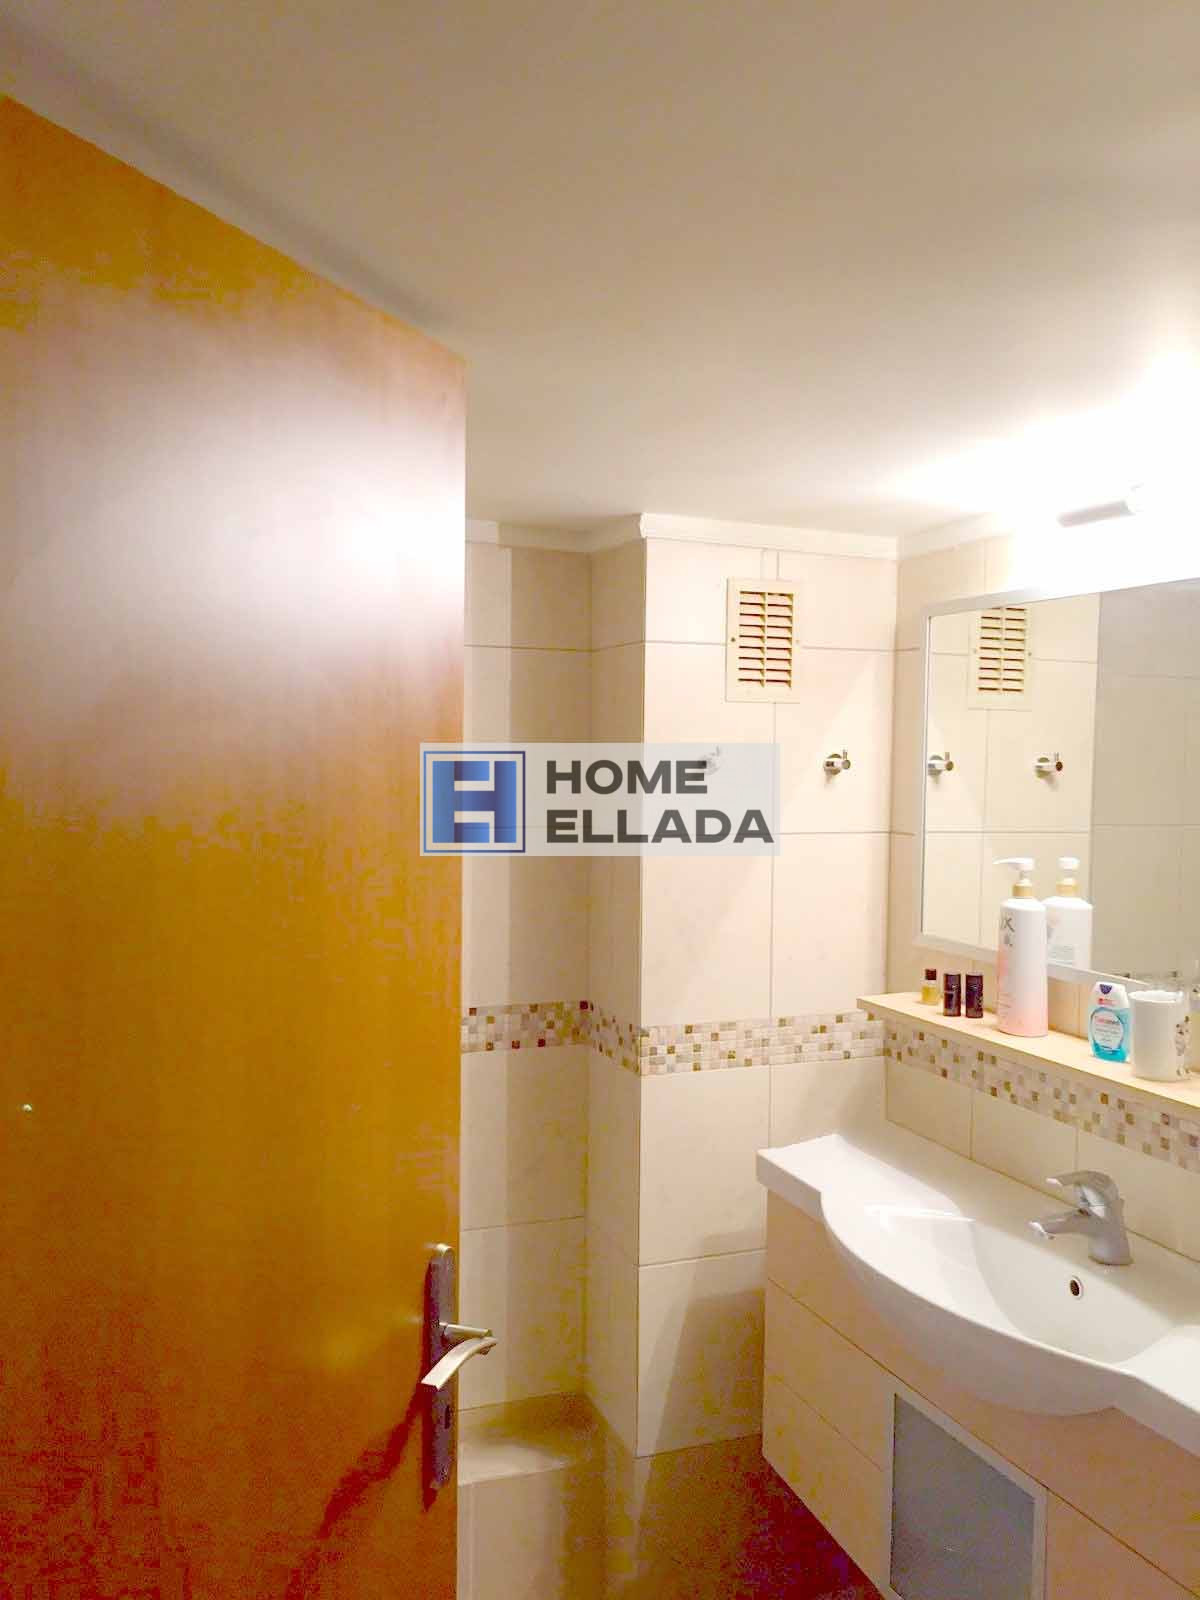 For sale apartment Zografu Ilisia - Athens 82 m²